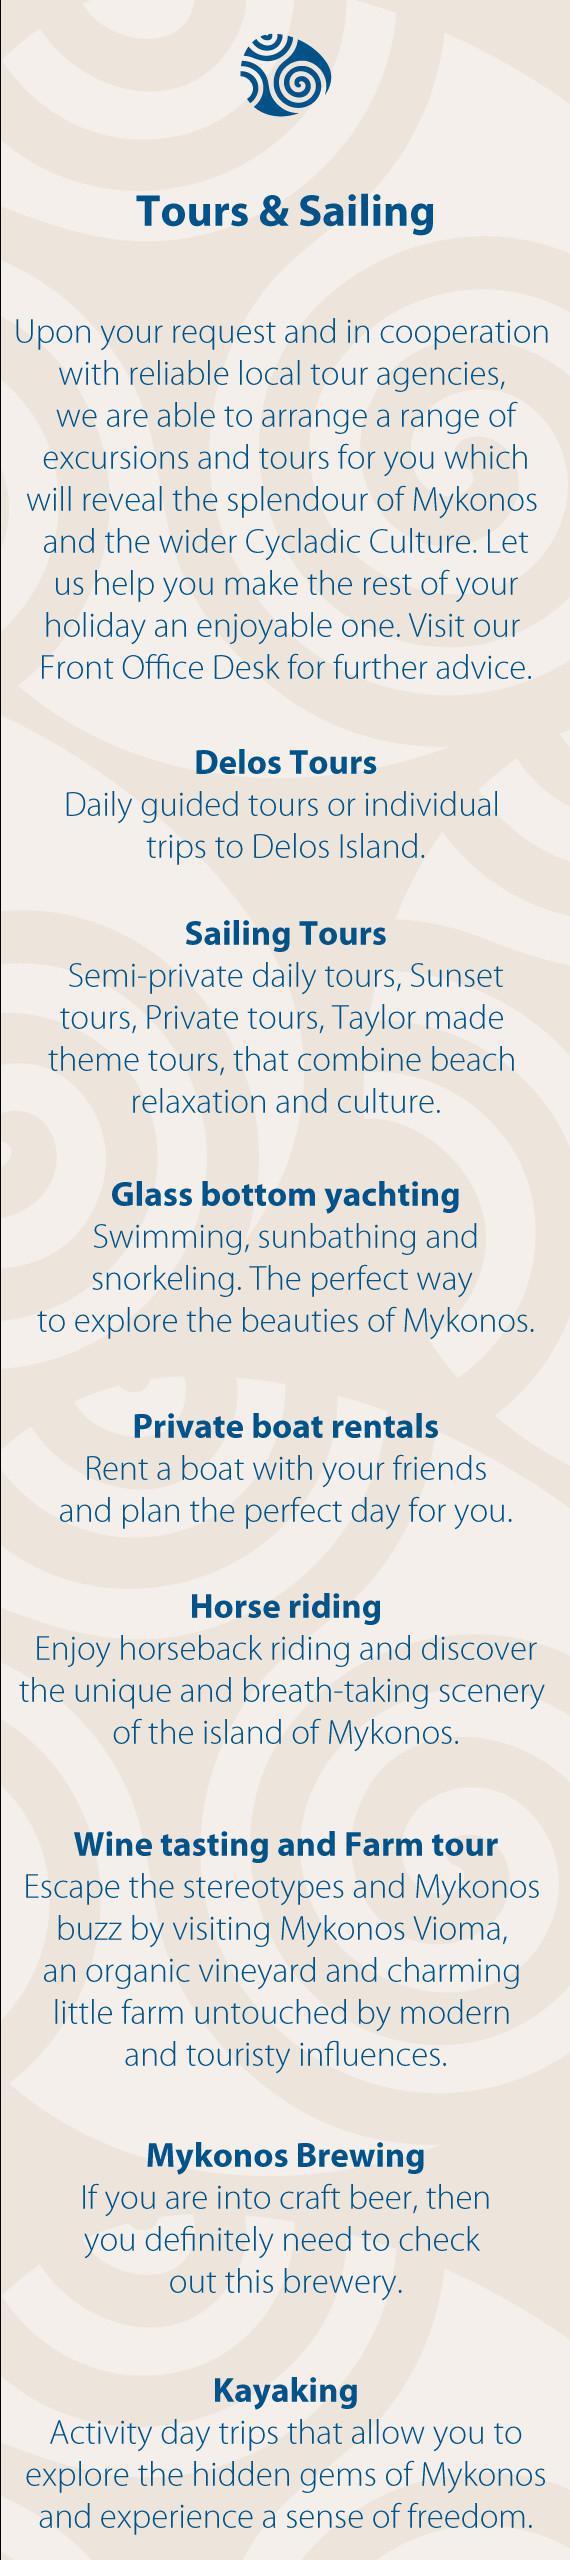 Tours & Sailing